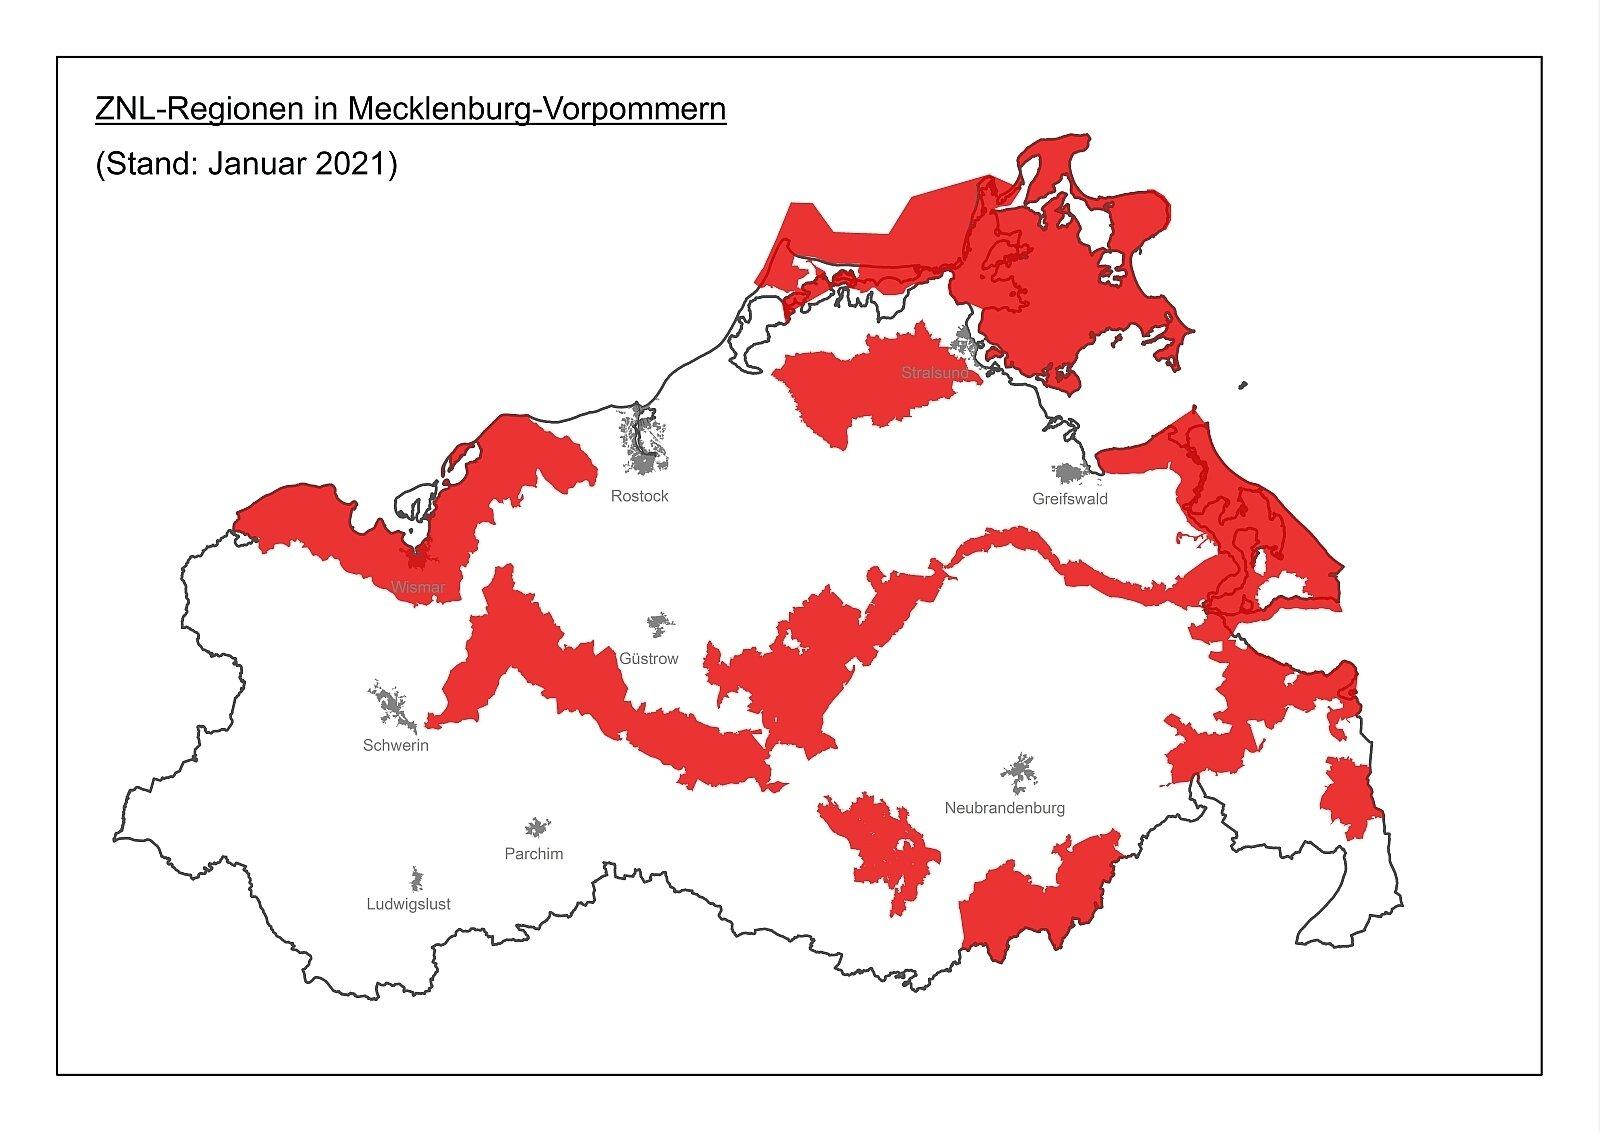 znl regionen mv stand januar 2021